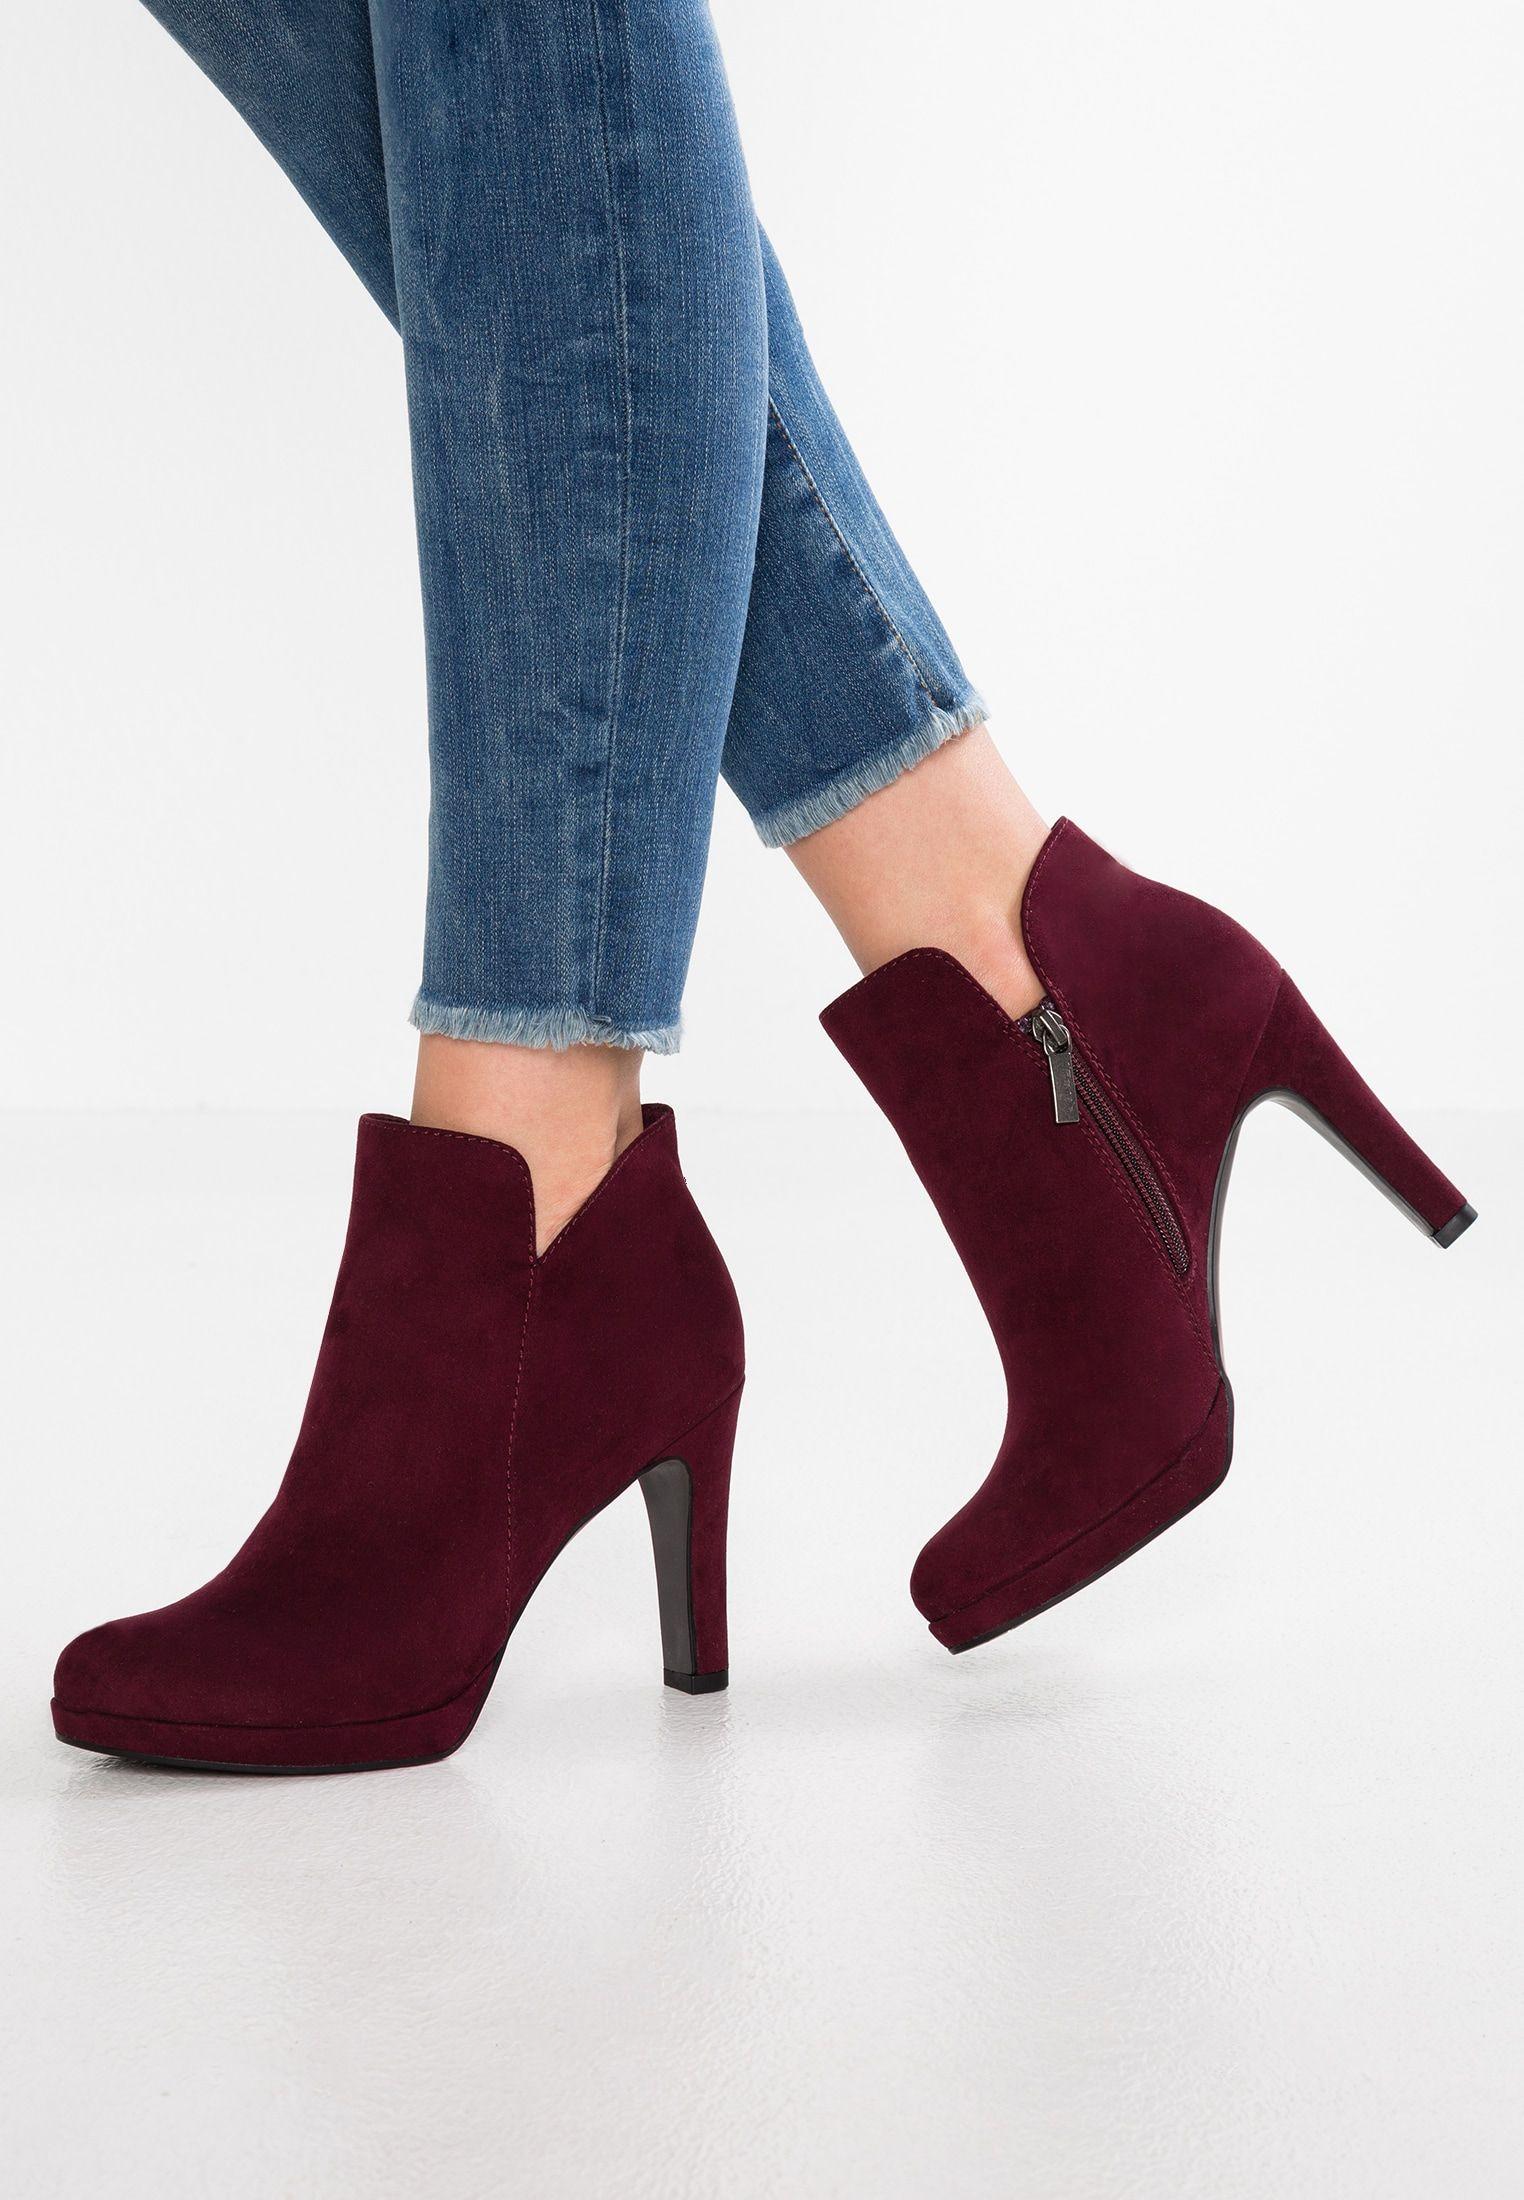 Neue Schwarze Tamaris Schuhe online kaufen | ZALANDO